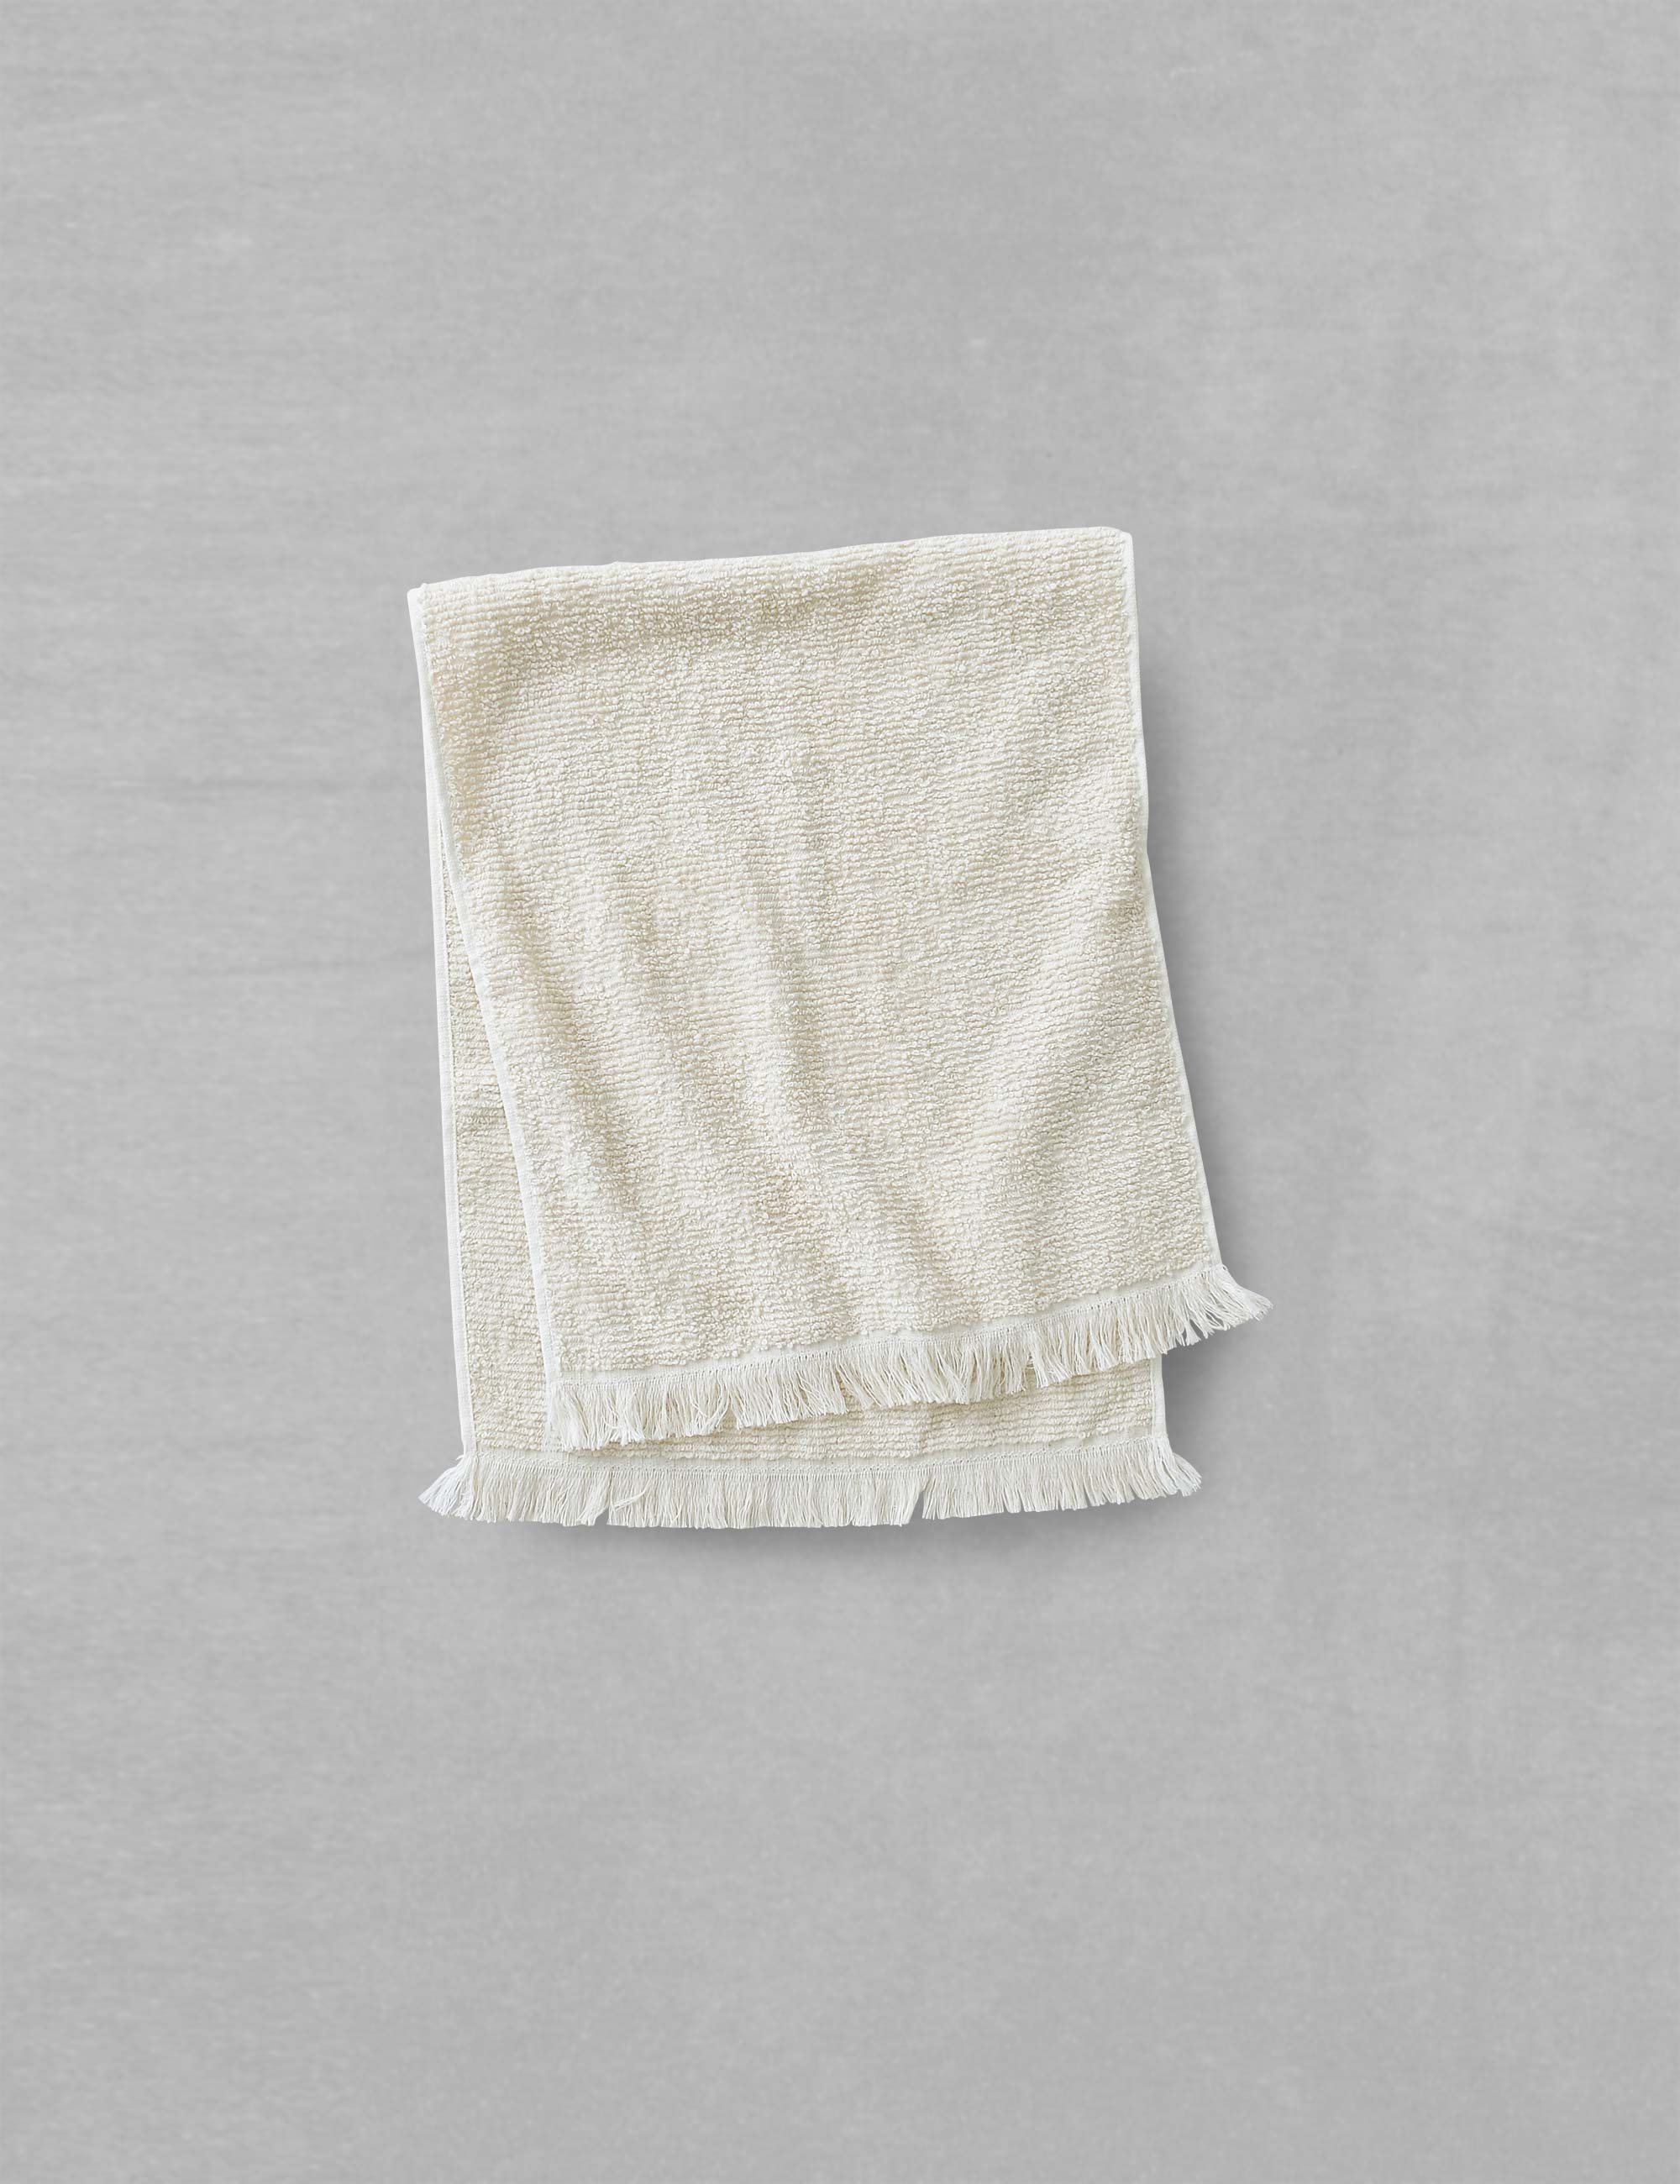 Jurgen Lehl Organic Cotton Towel